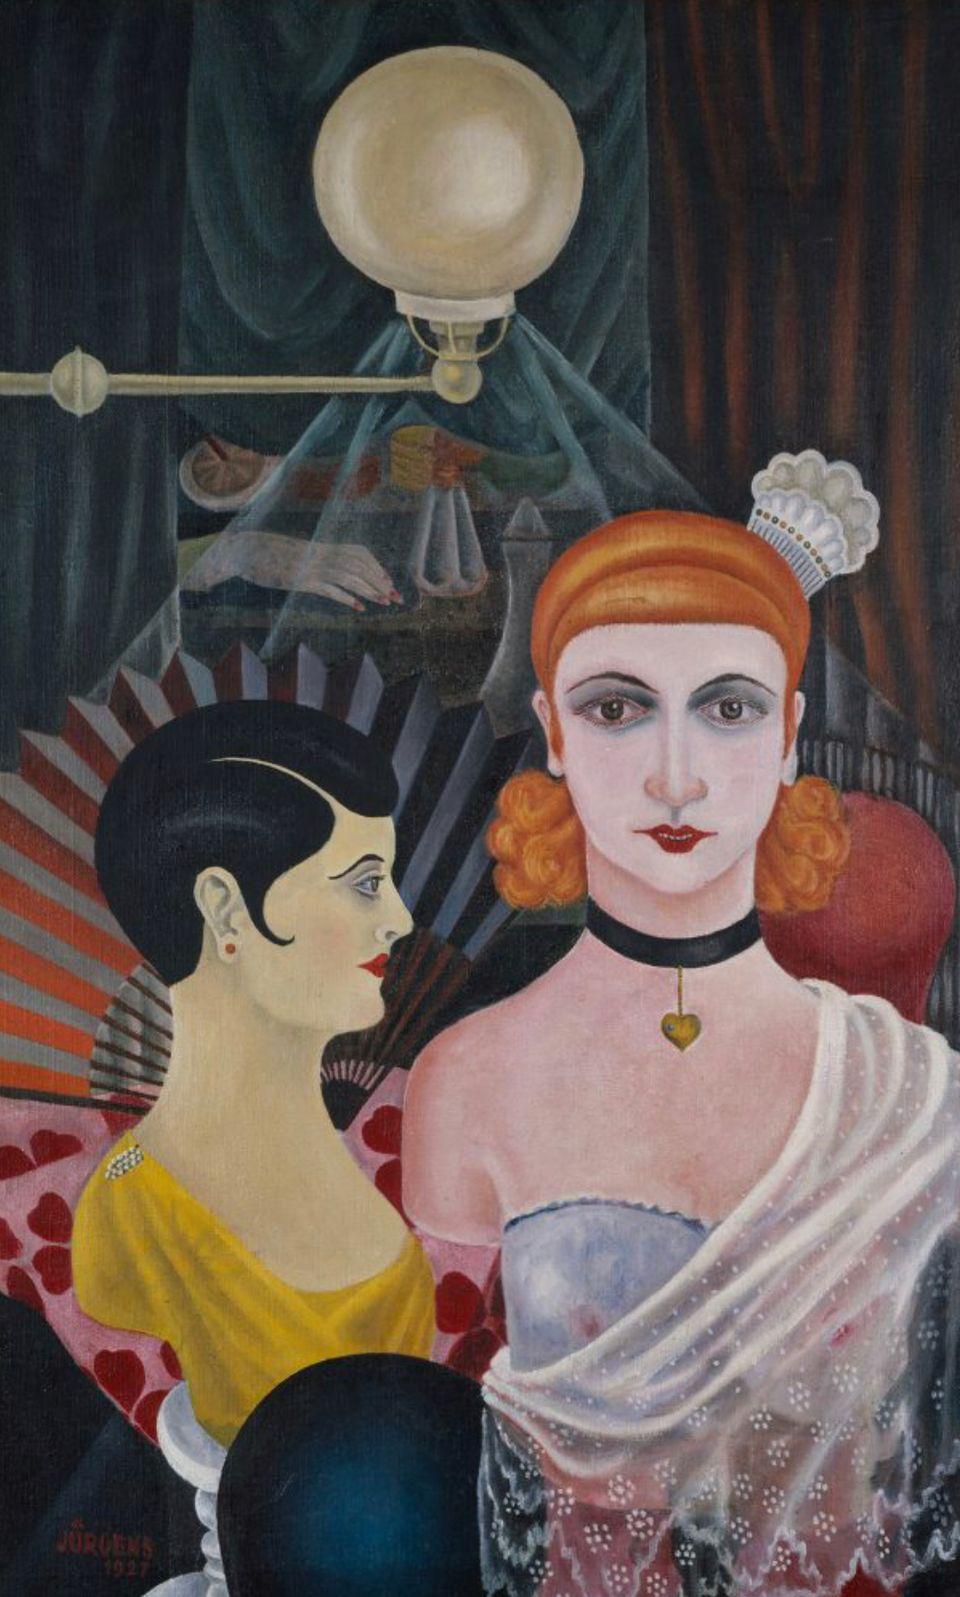 Grethe Jürgens Maniquíes de peluquería (Frisierpuppen), 1927 © Sprengel Museum Hannover, Vermächtnis...